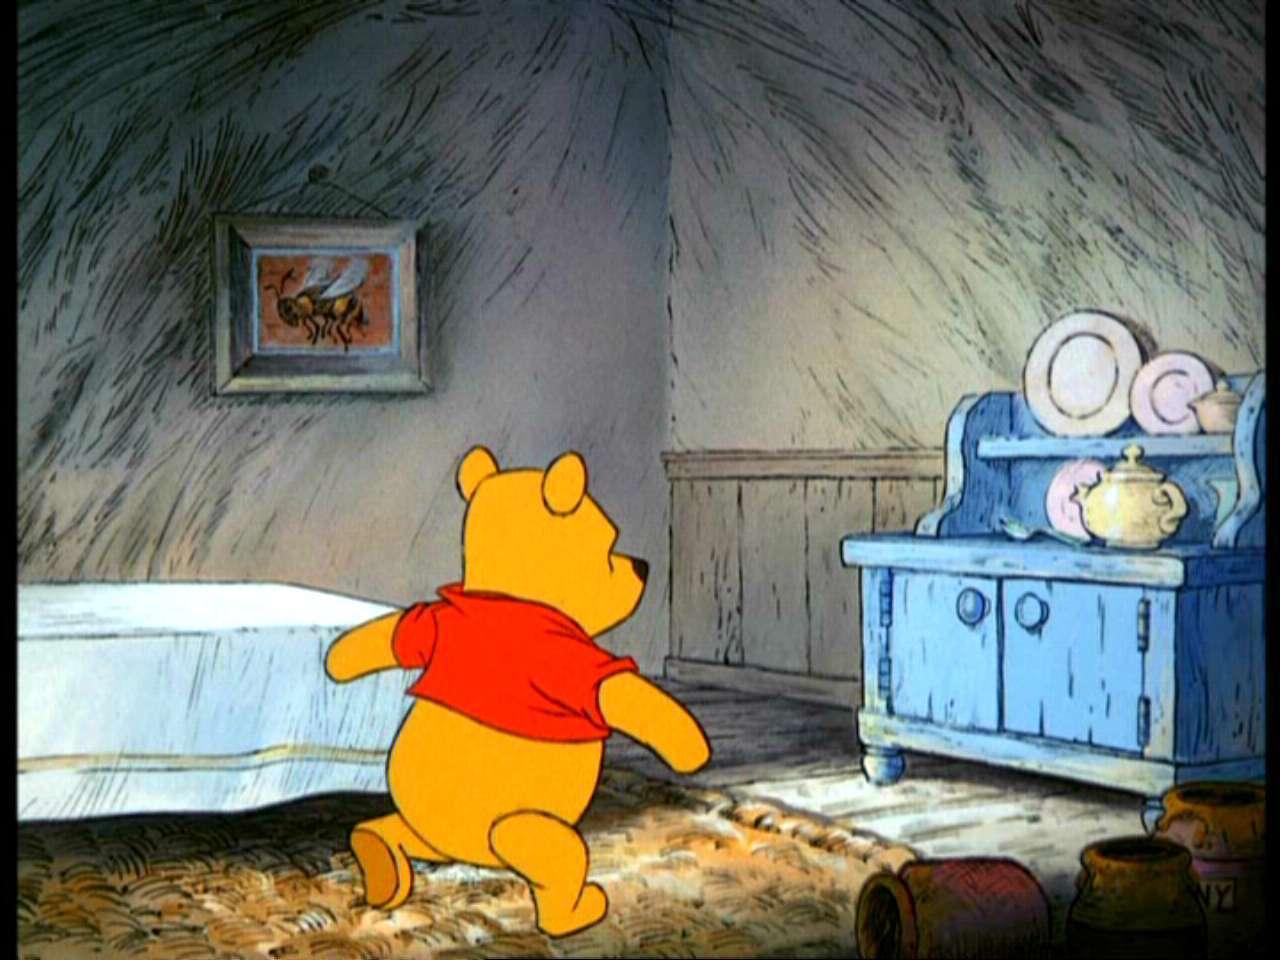 Winnie-the-Pooh-and-the-Hunny-Tree-winnie-the-pooh-2034887-1280-960 ...